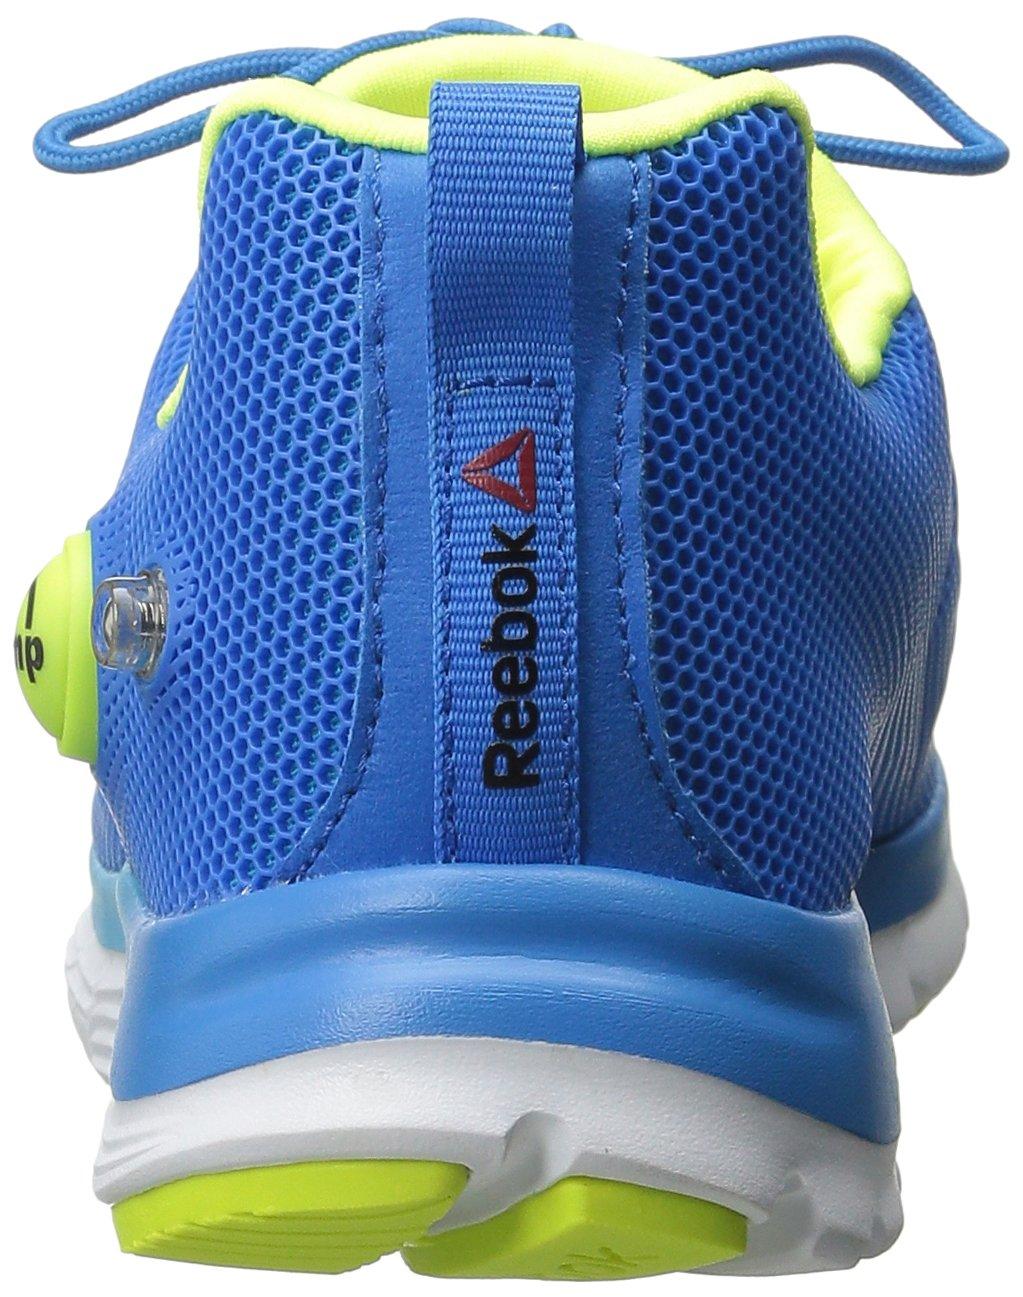 71k g6NDFgL - Reebok Women's Z Pump Fusion Polyurethane Running Shoe